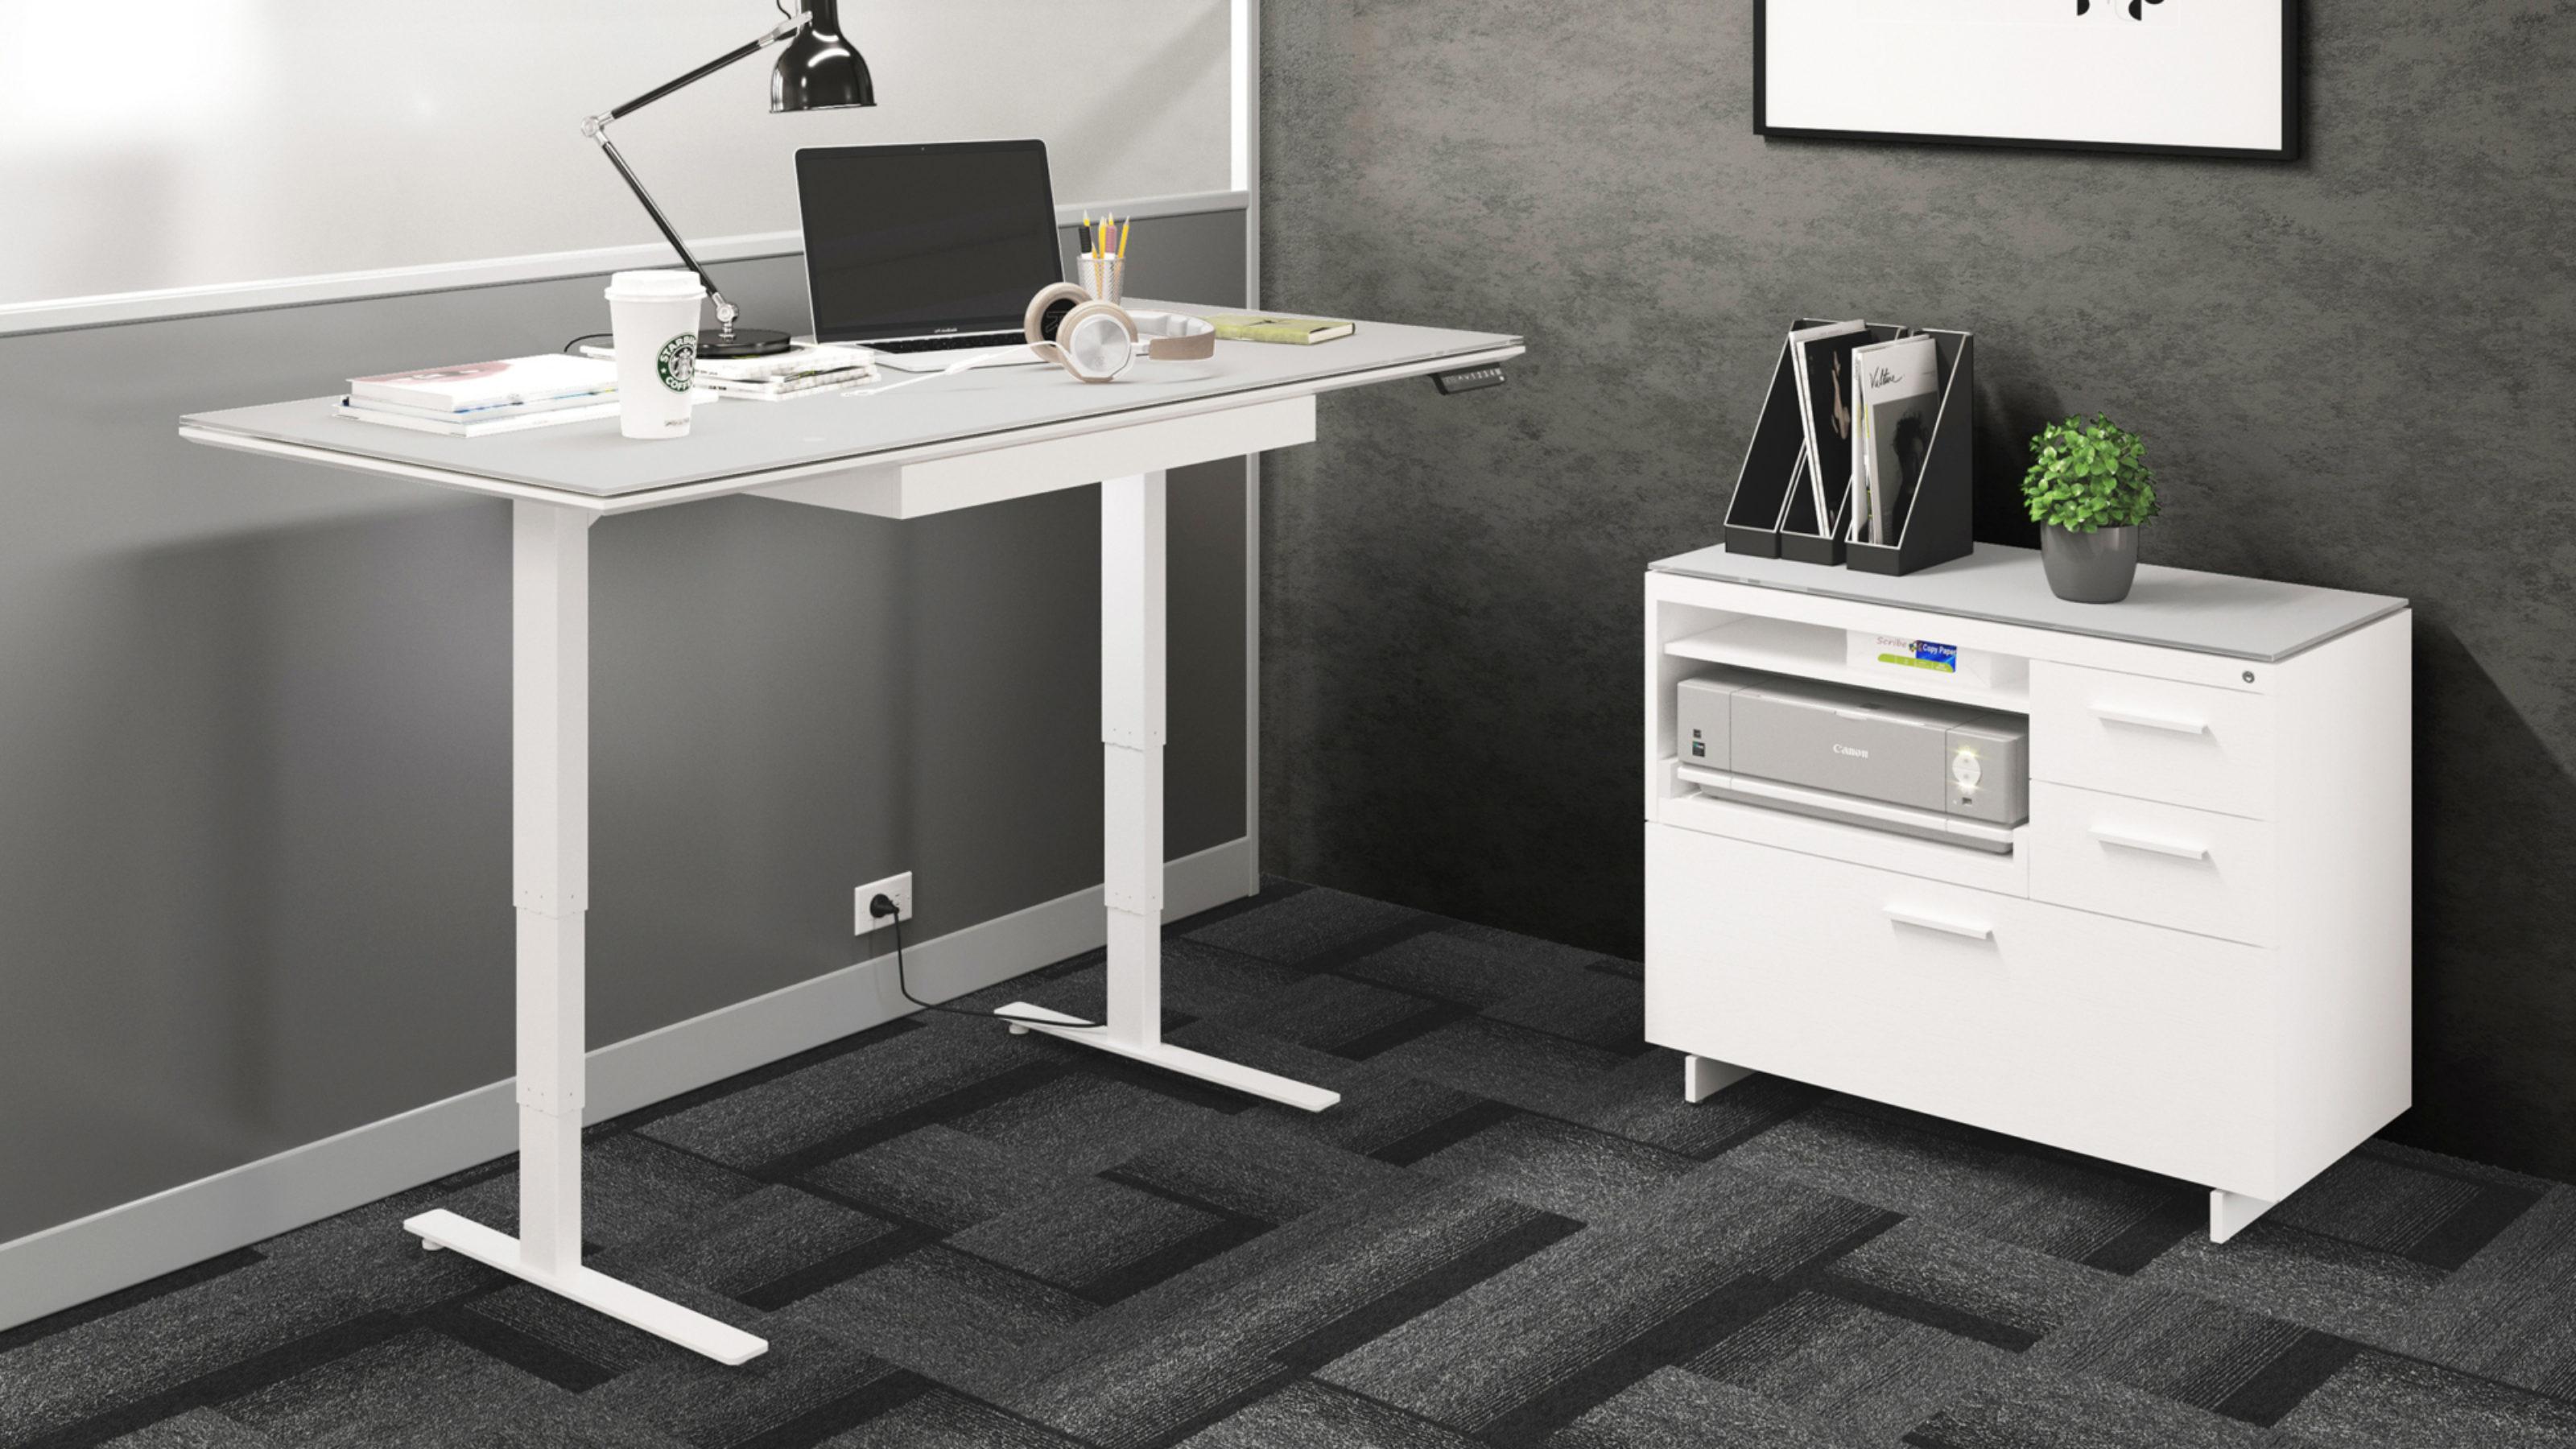 Centro 6452 2 Height Adjustable Standing Desk 66 X30 Bdi Furniture